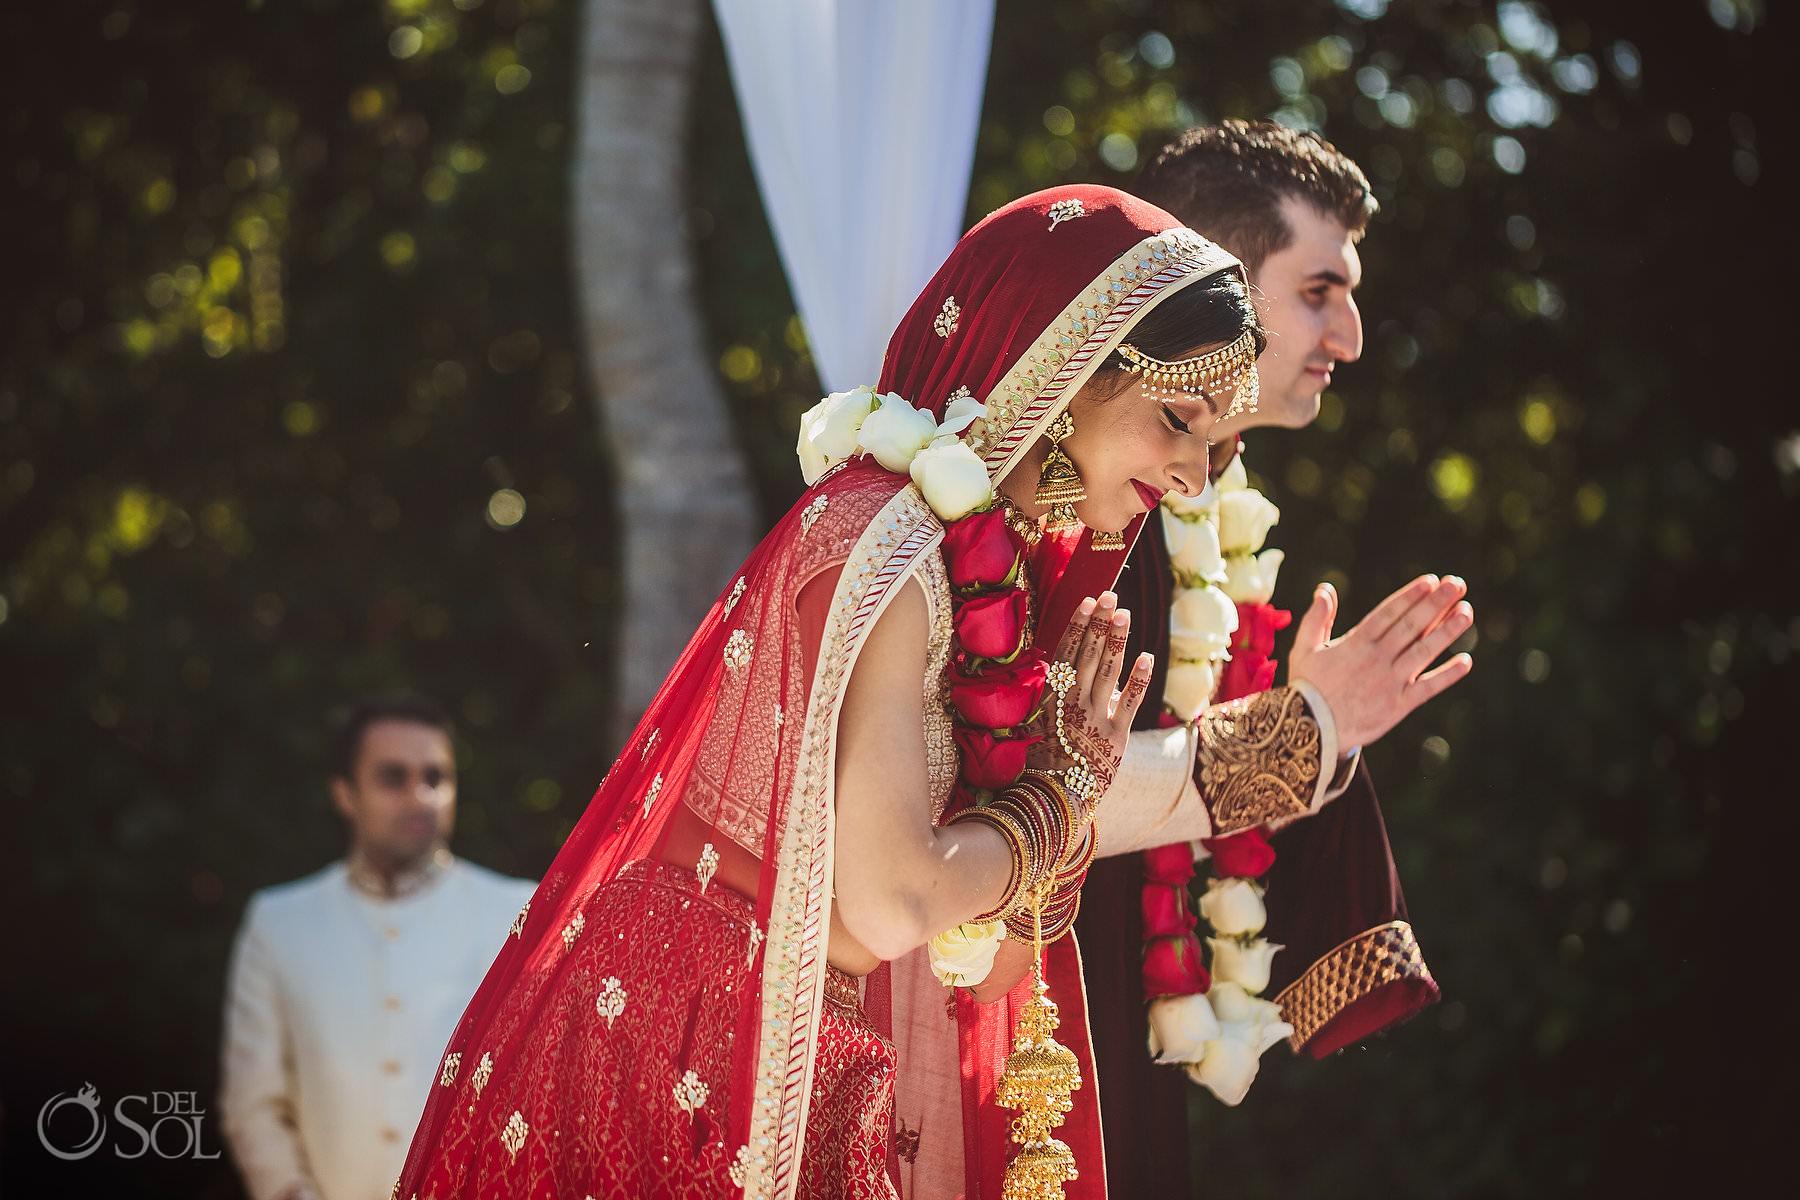 Prayer to Ganesha Couple bow wearing Floral Garlands Hindu wedding ceremony Mexico Dreams Tulum Riviera Maya